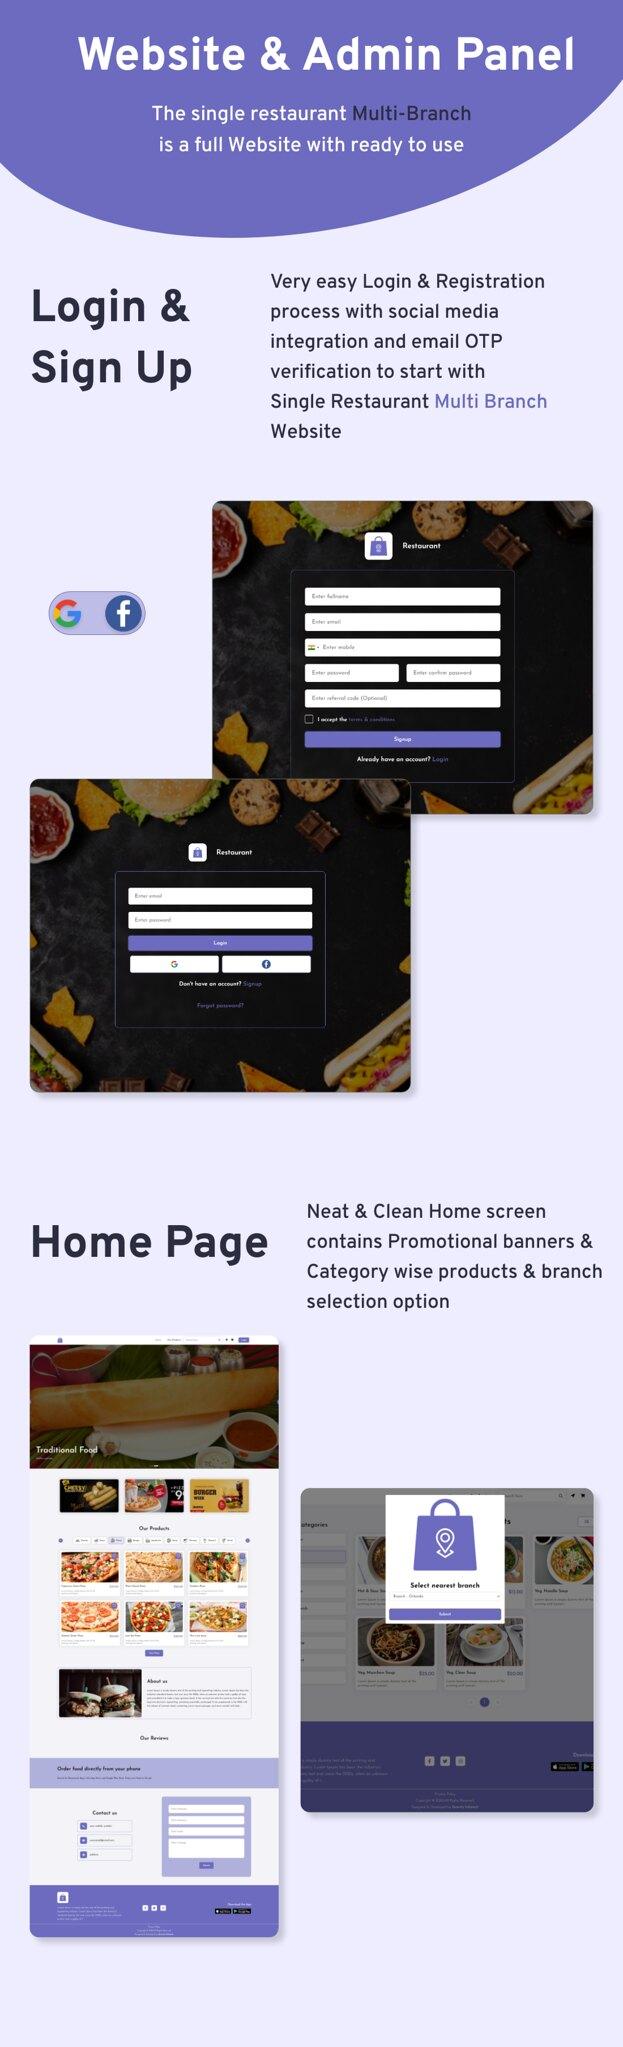 Multi-Branch Restaurant - Laravel Web Admin Panel - 7